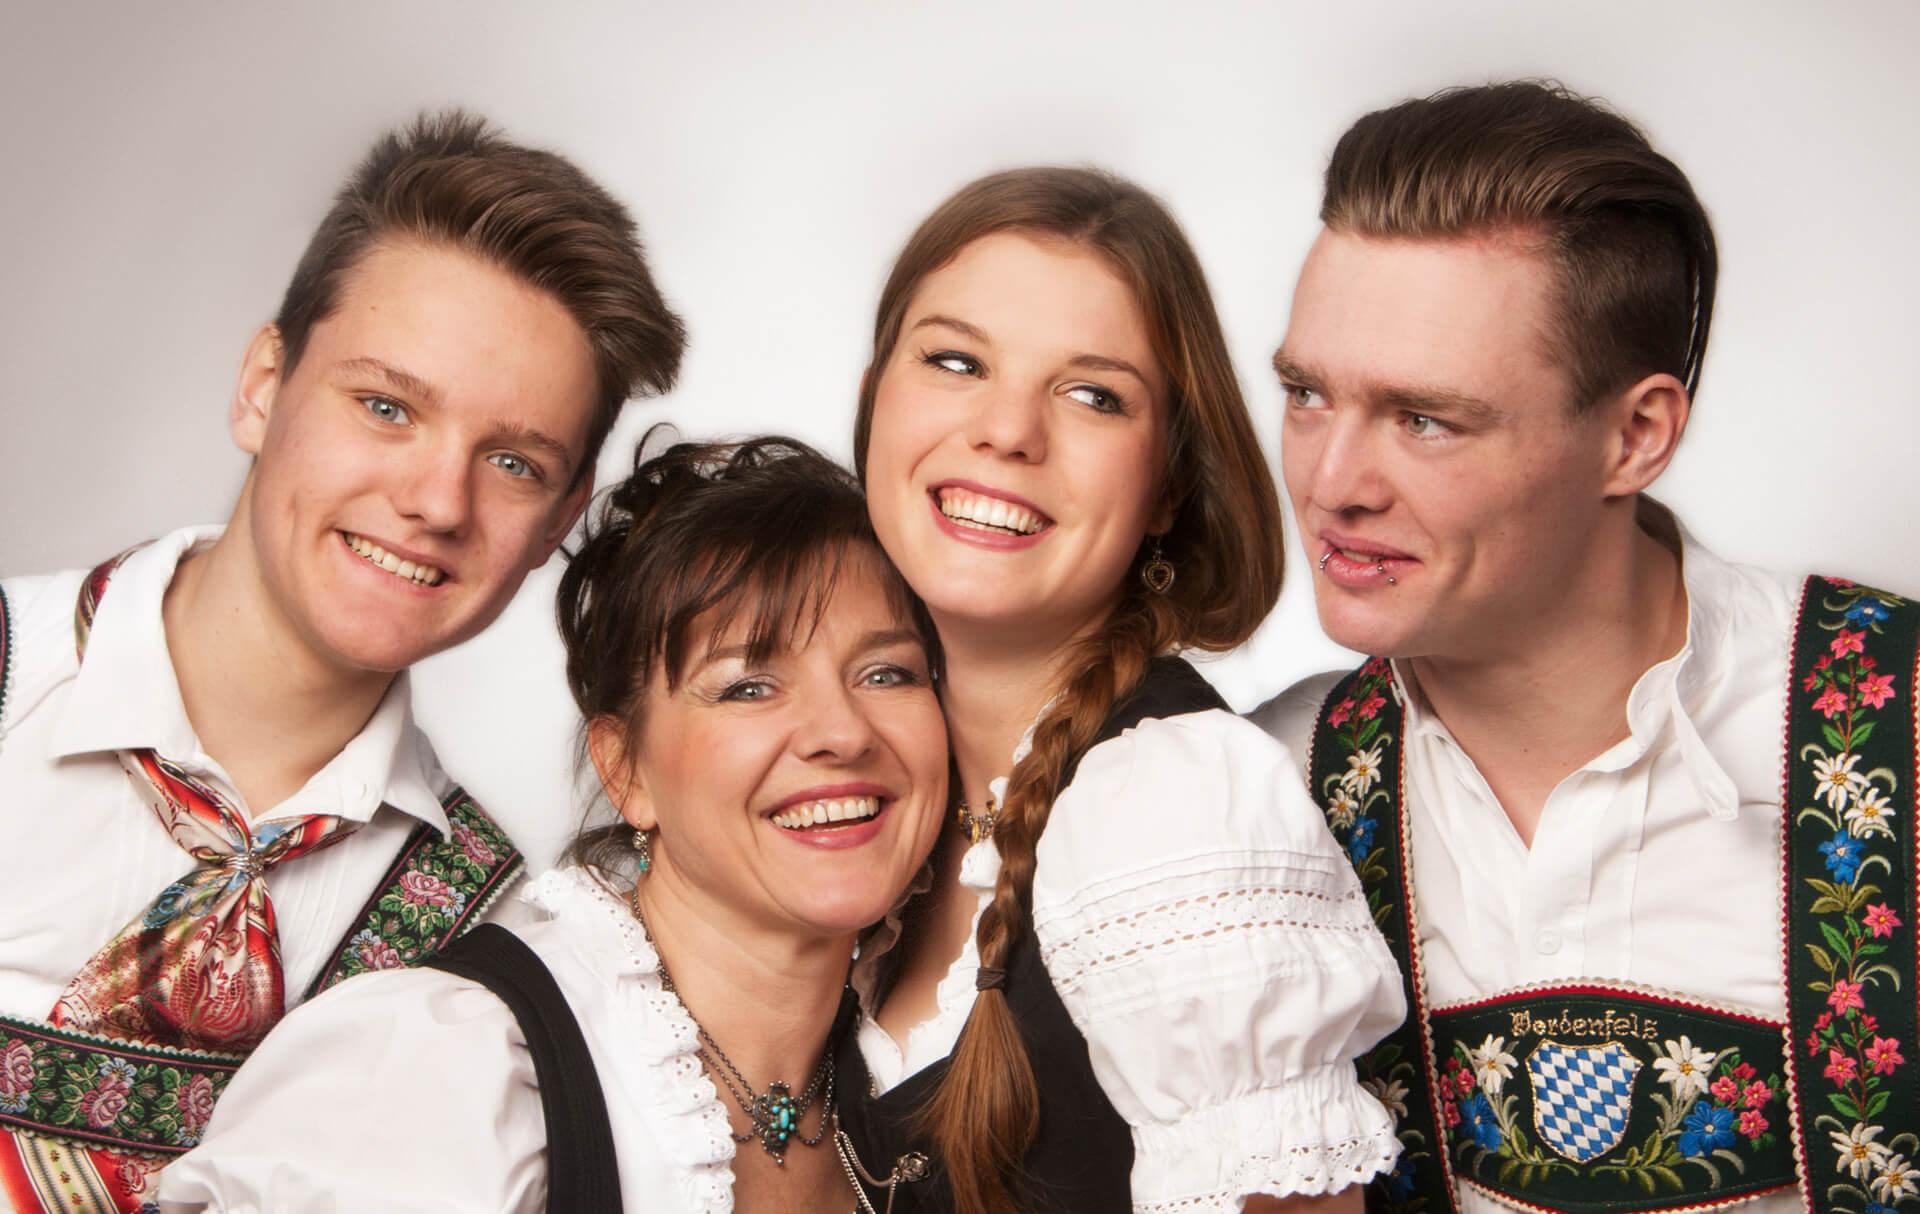 familienfotografie_fotostudio Dirndl Familie in Tracht